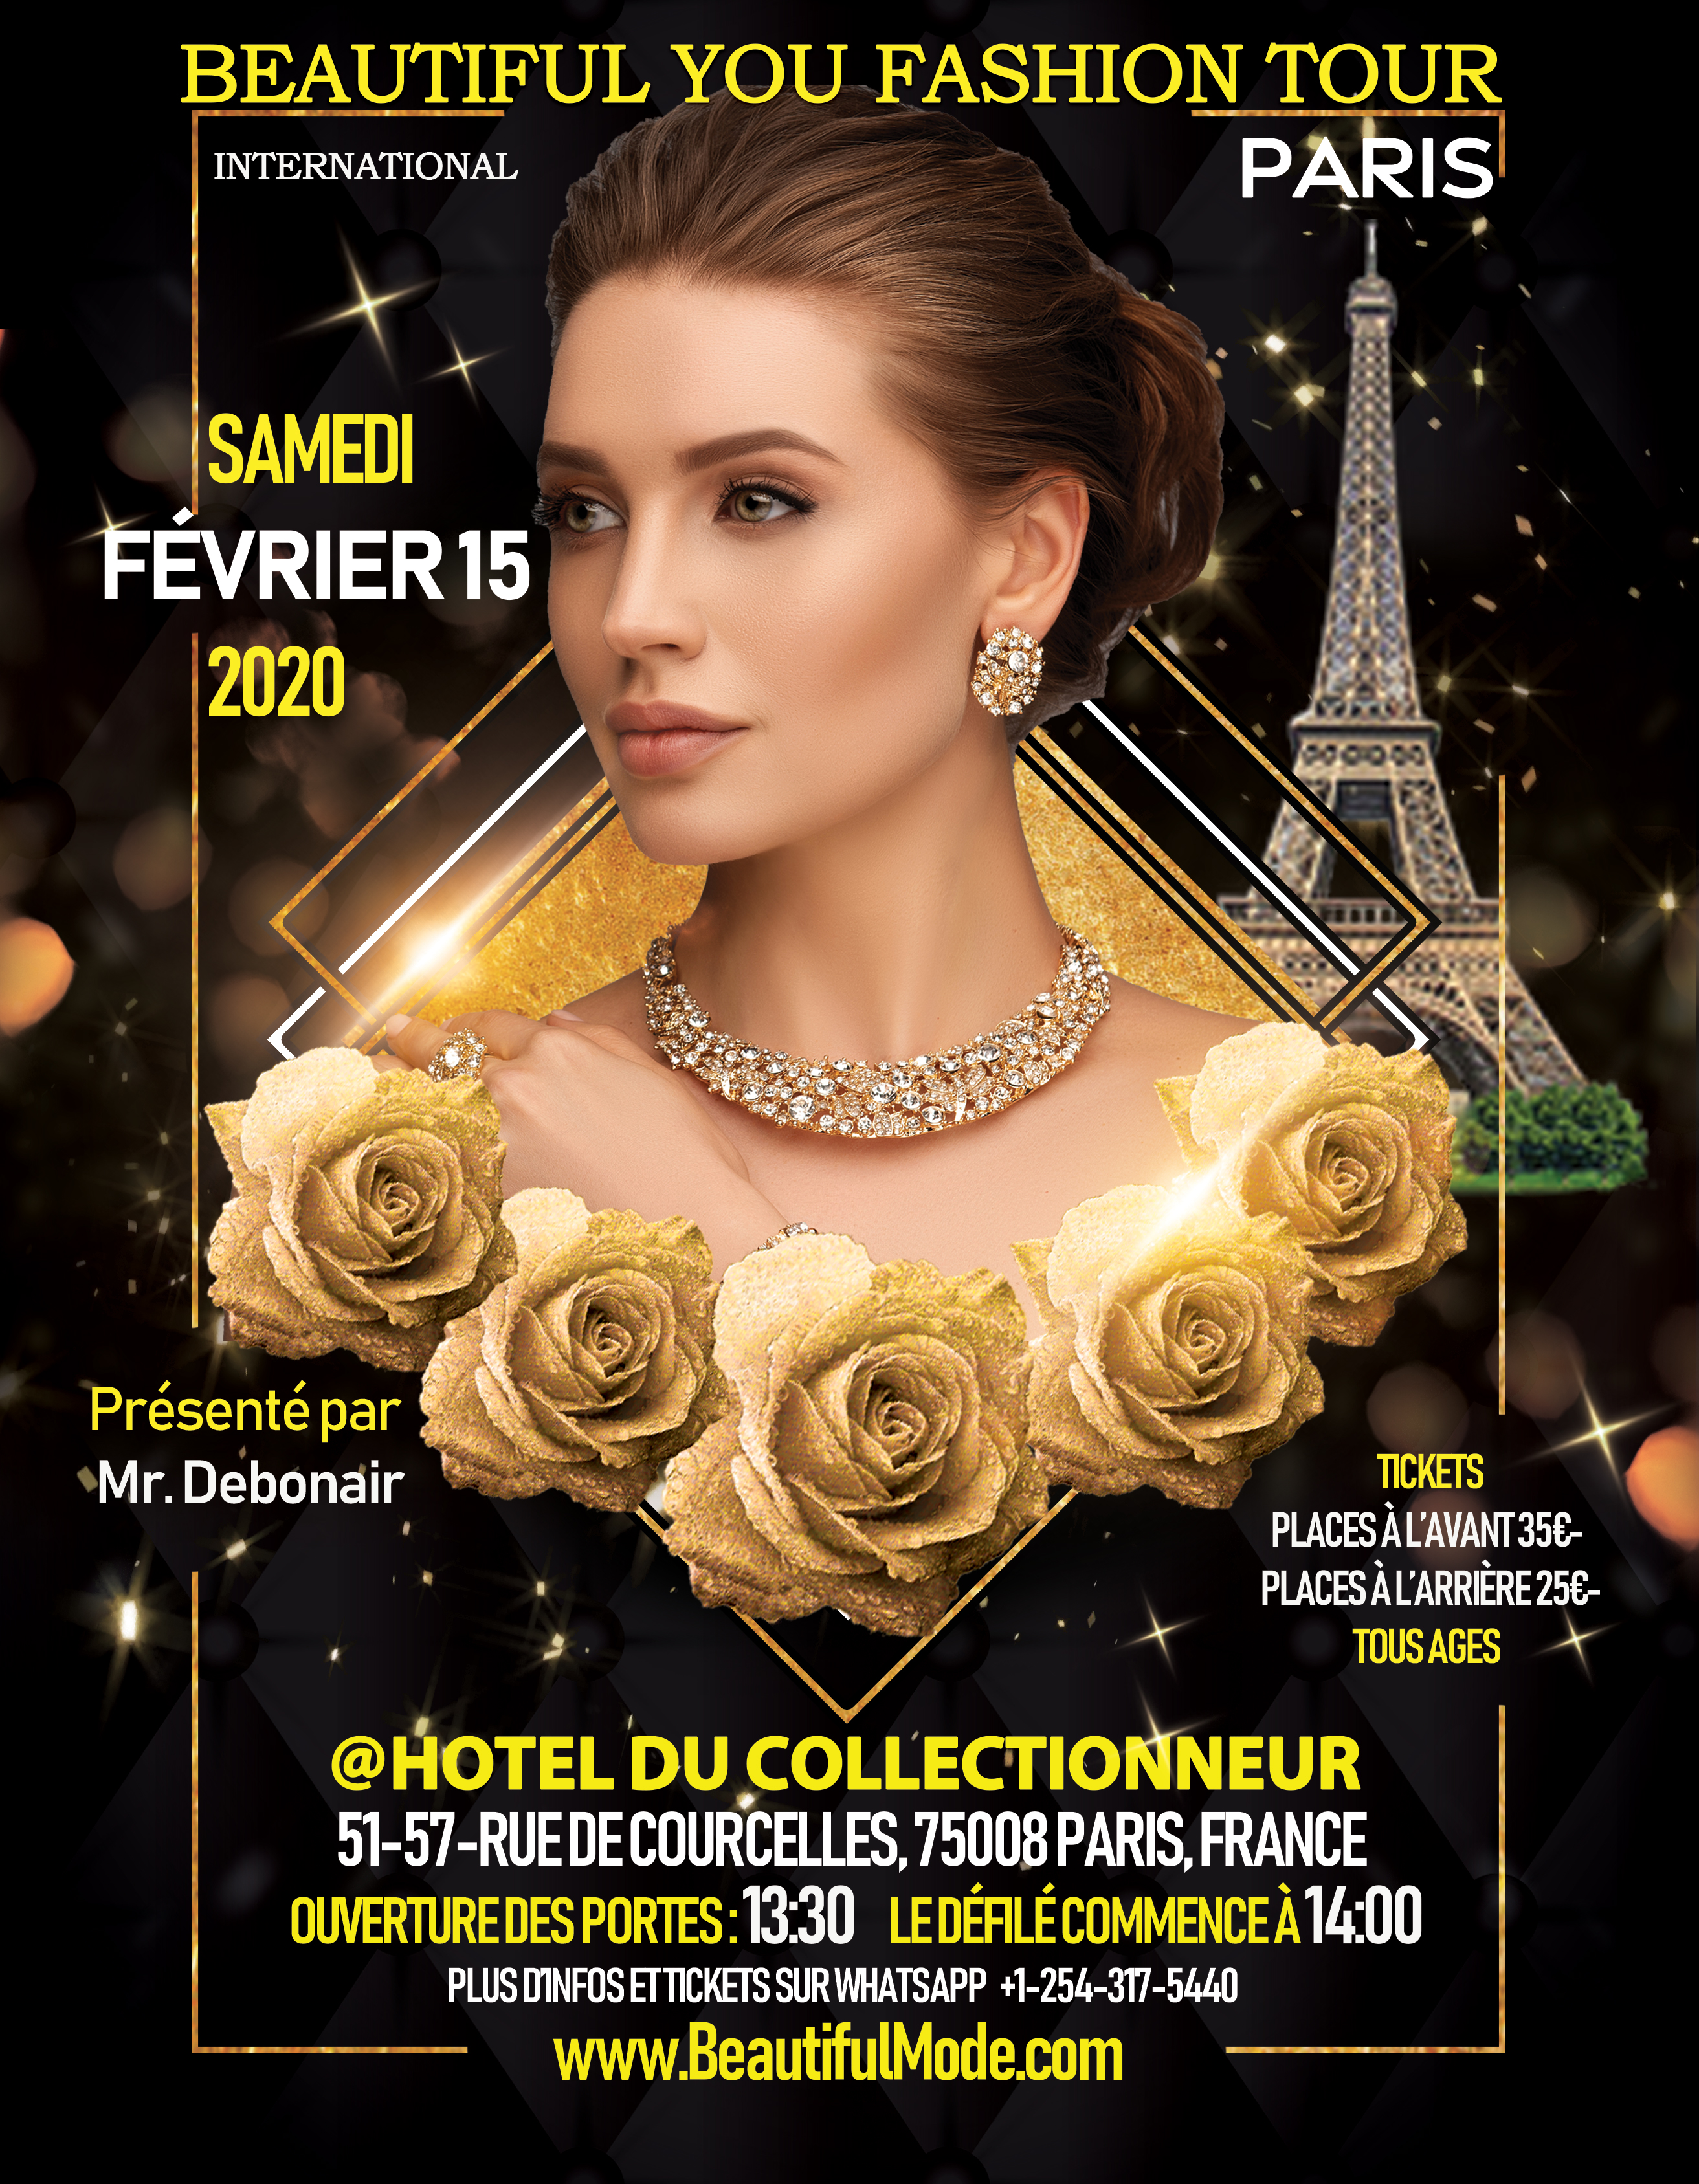 Paris, France</a><br> by <a href='/profile/Mr-Debonair/'>Mr. Debonair</a>